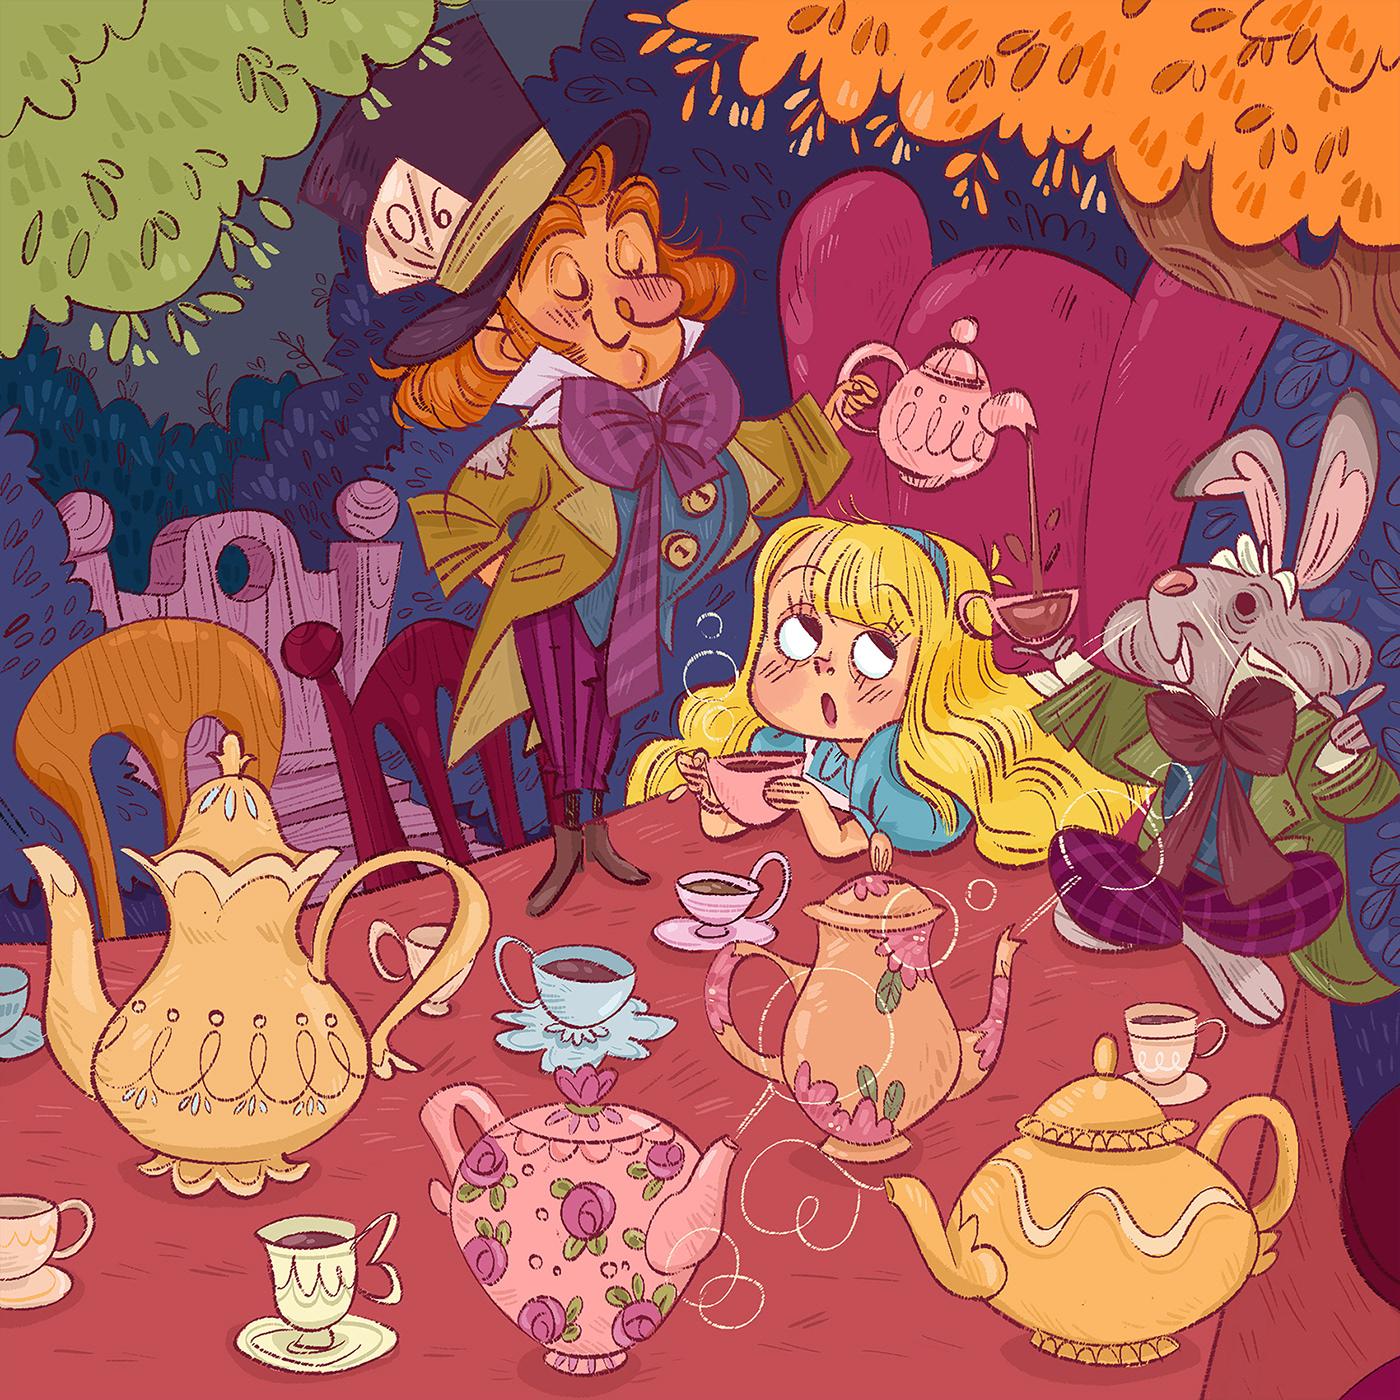 alcieinwonderland Madhatter Marchhare teaparty rabbithole ctaerpillar kidlit